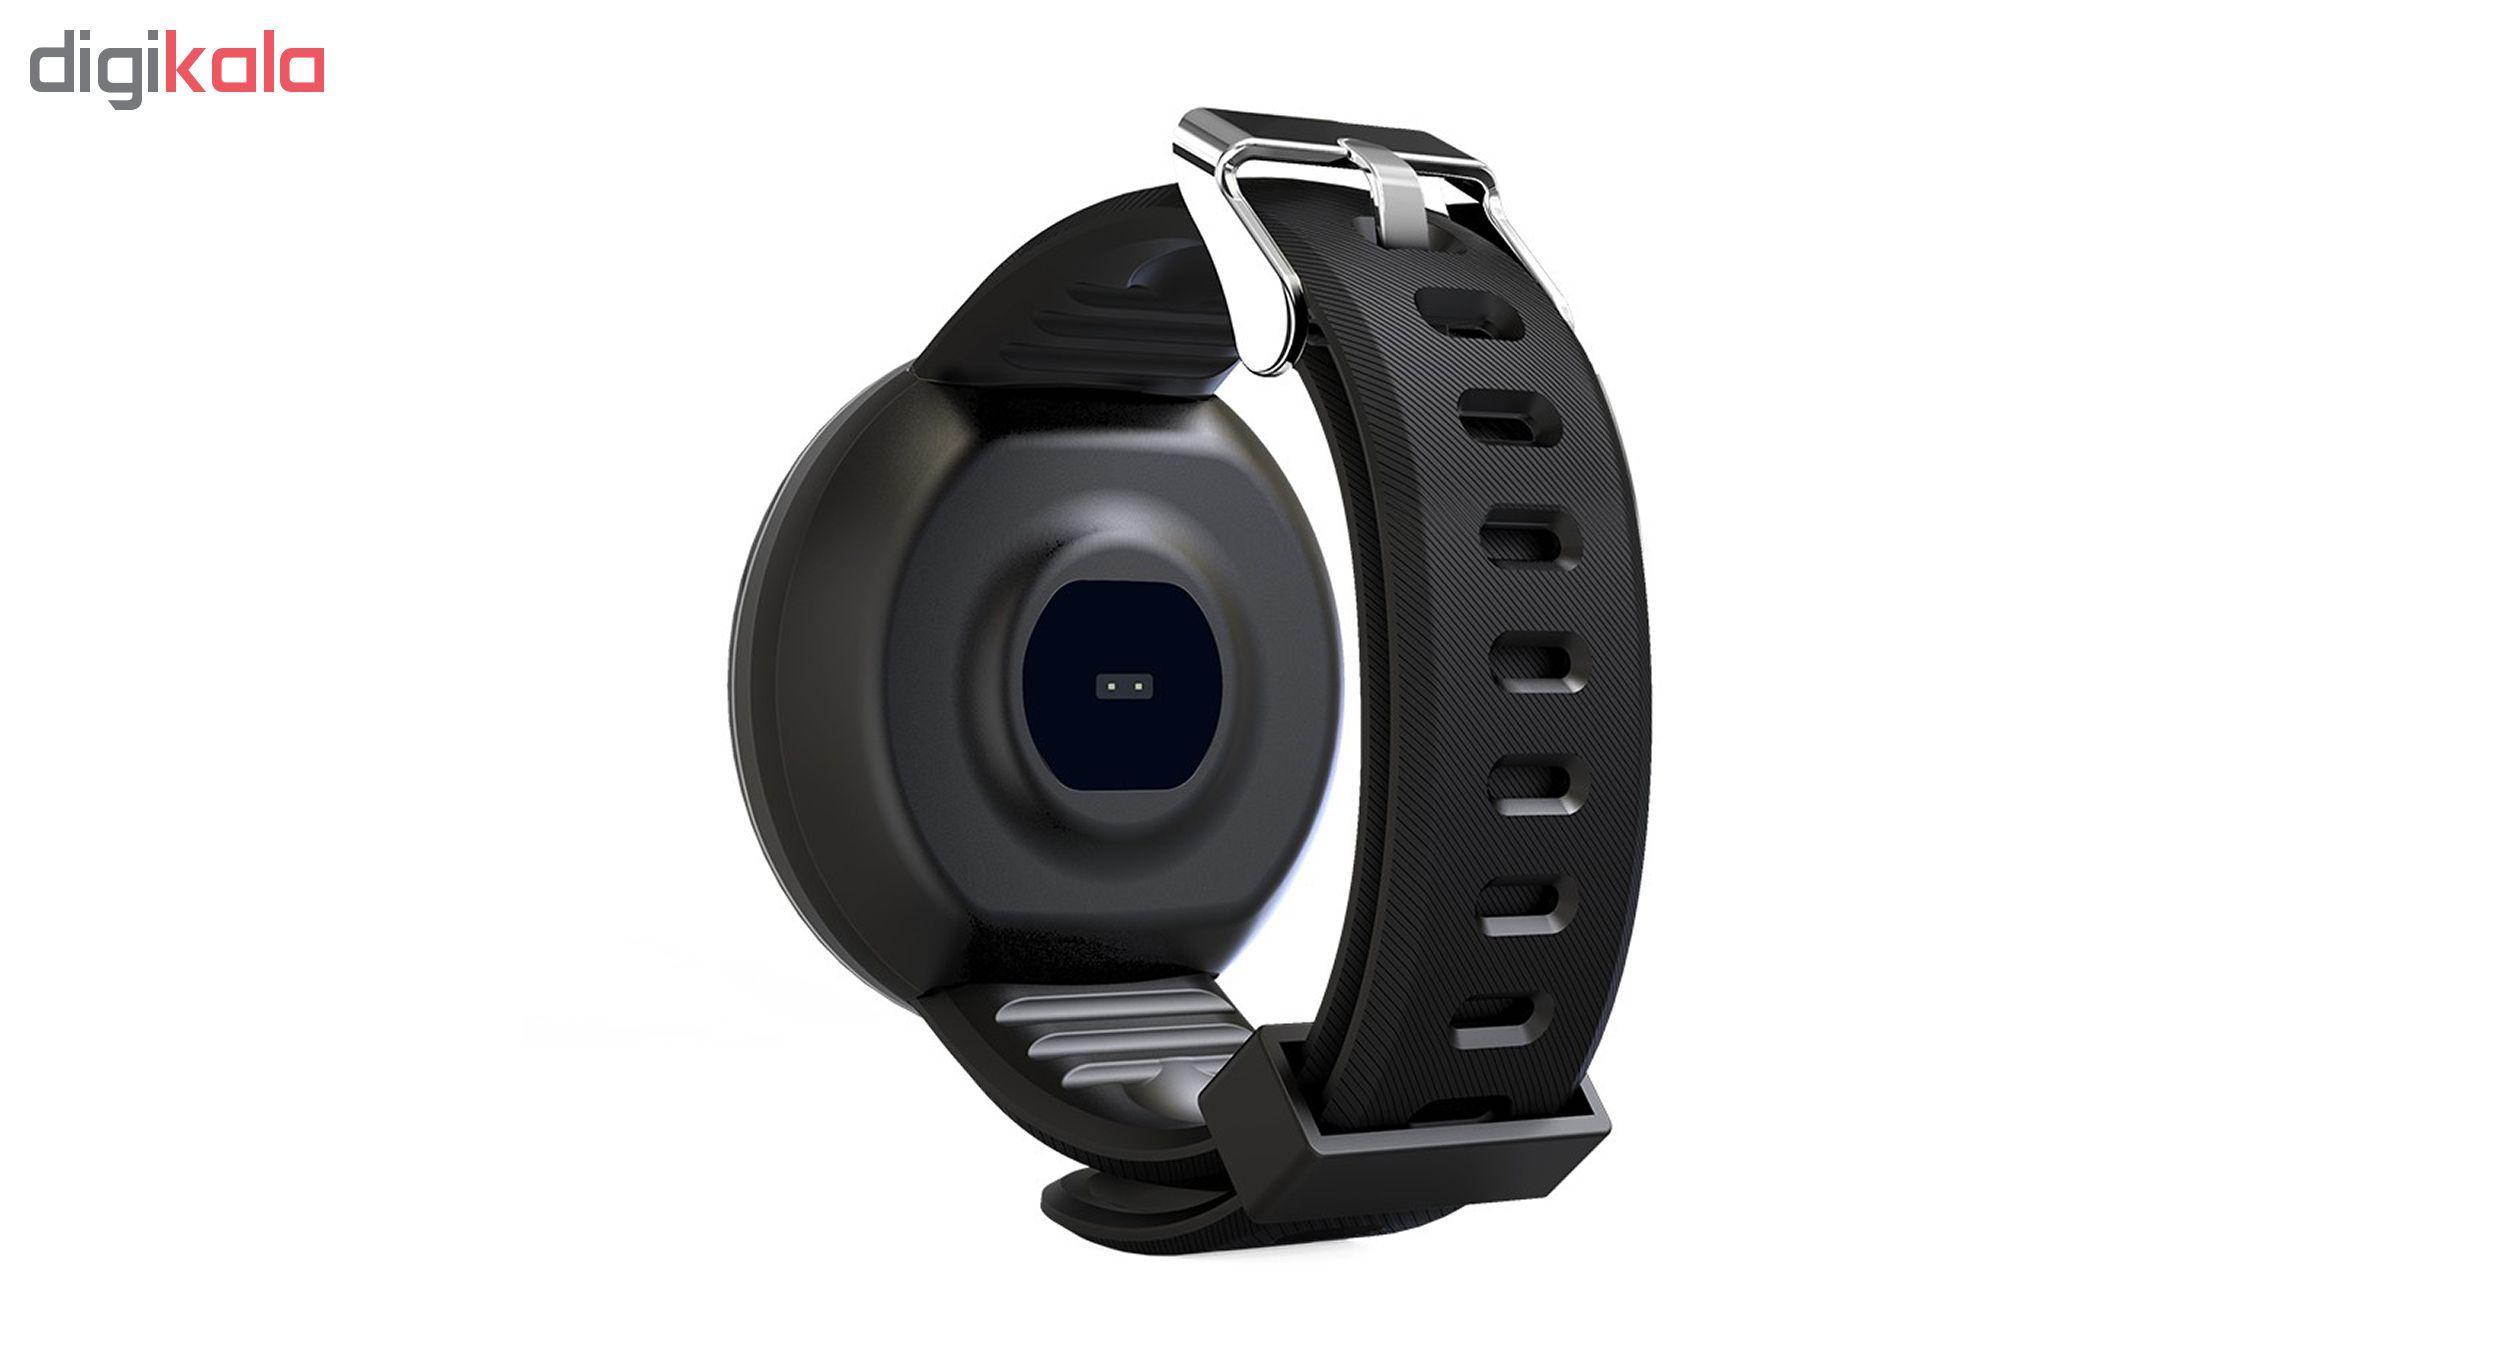 ساعت هوشمند مدل Bakeey D18 main 1 2